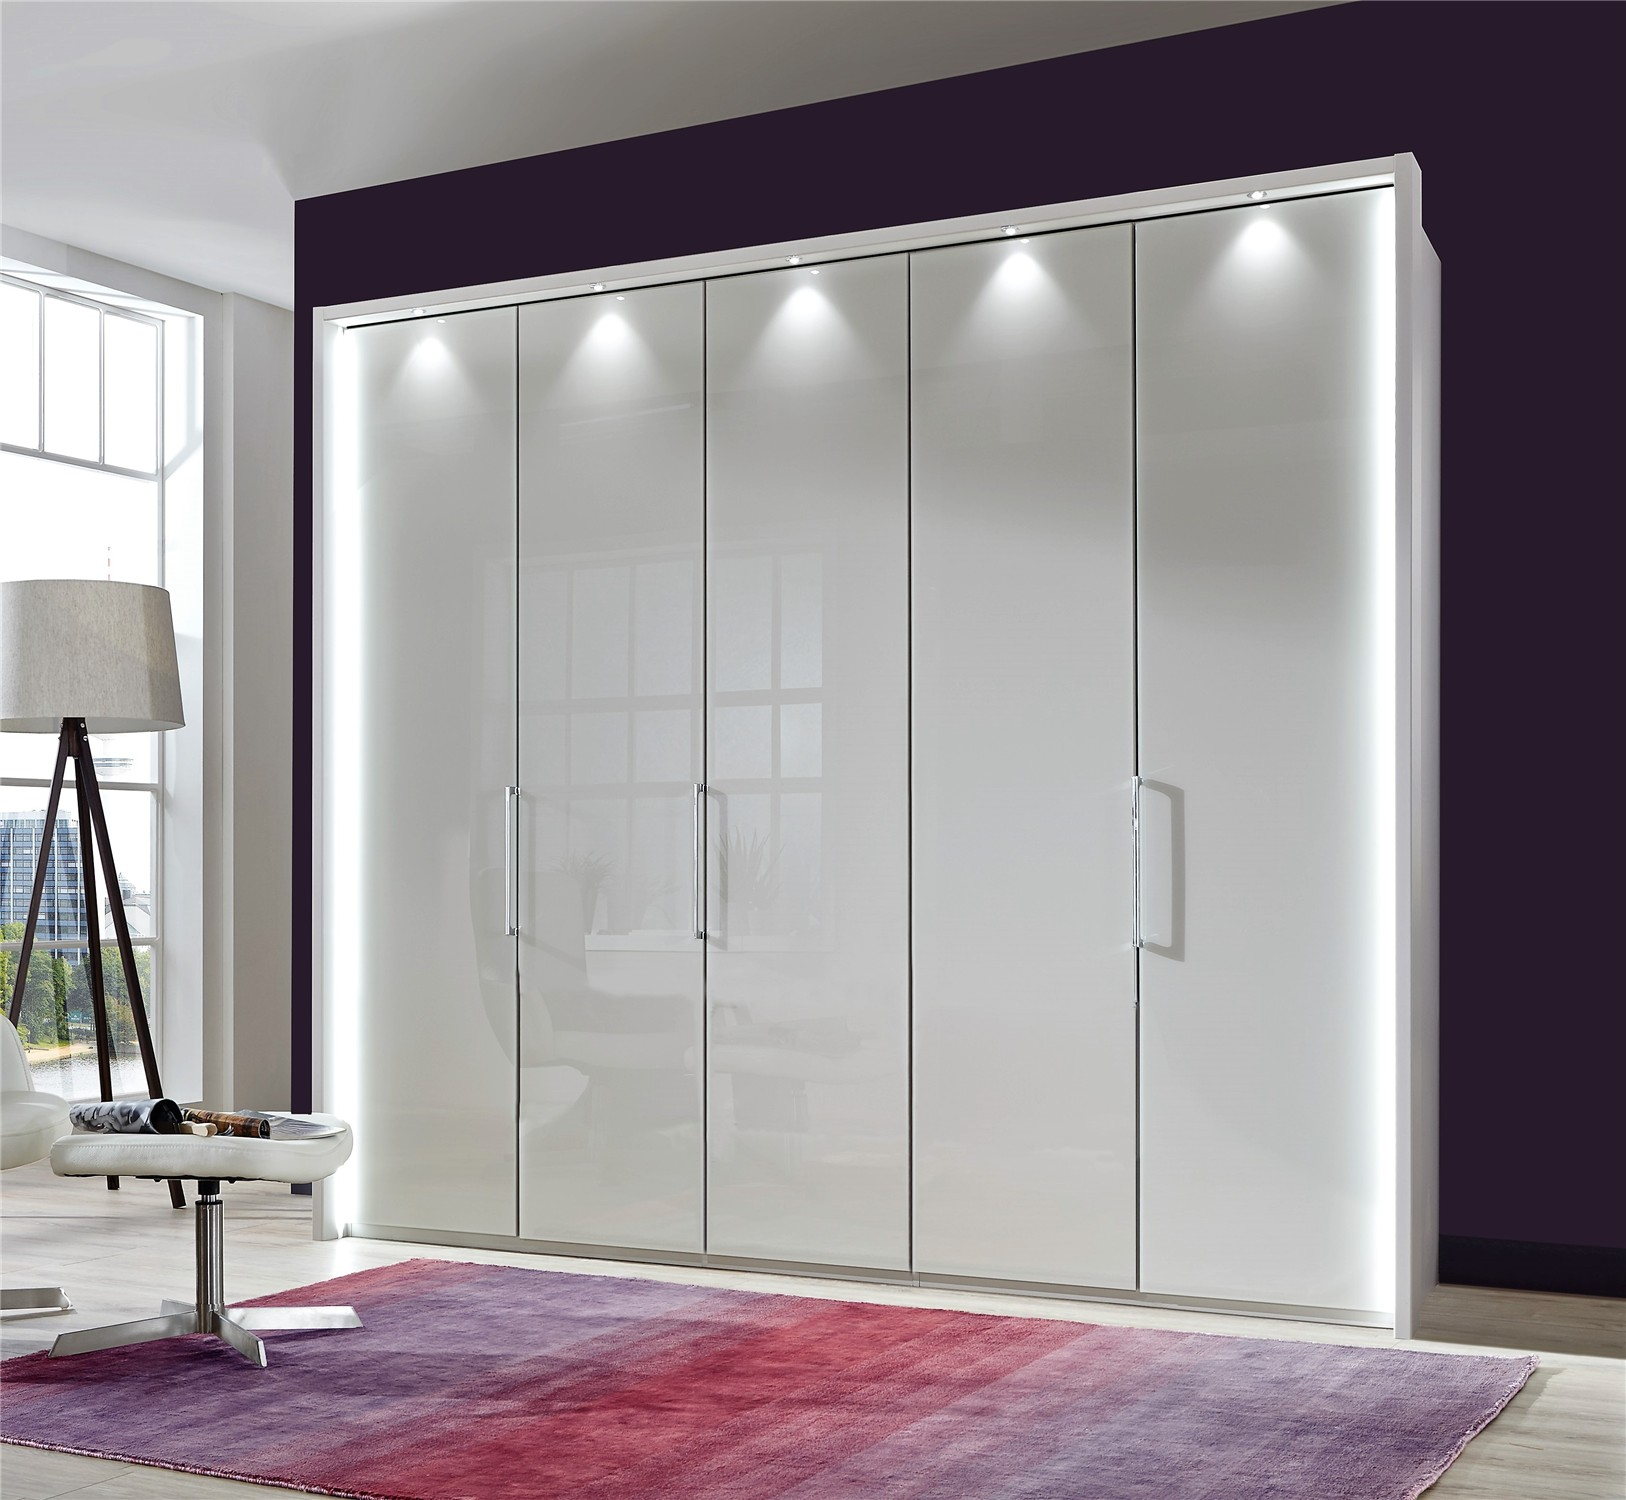 Bi Fold Glass Doors : Stylform poseidon glass bi fold hinged door wardrobe